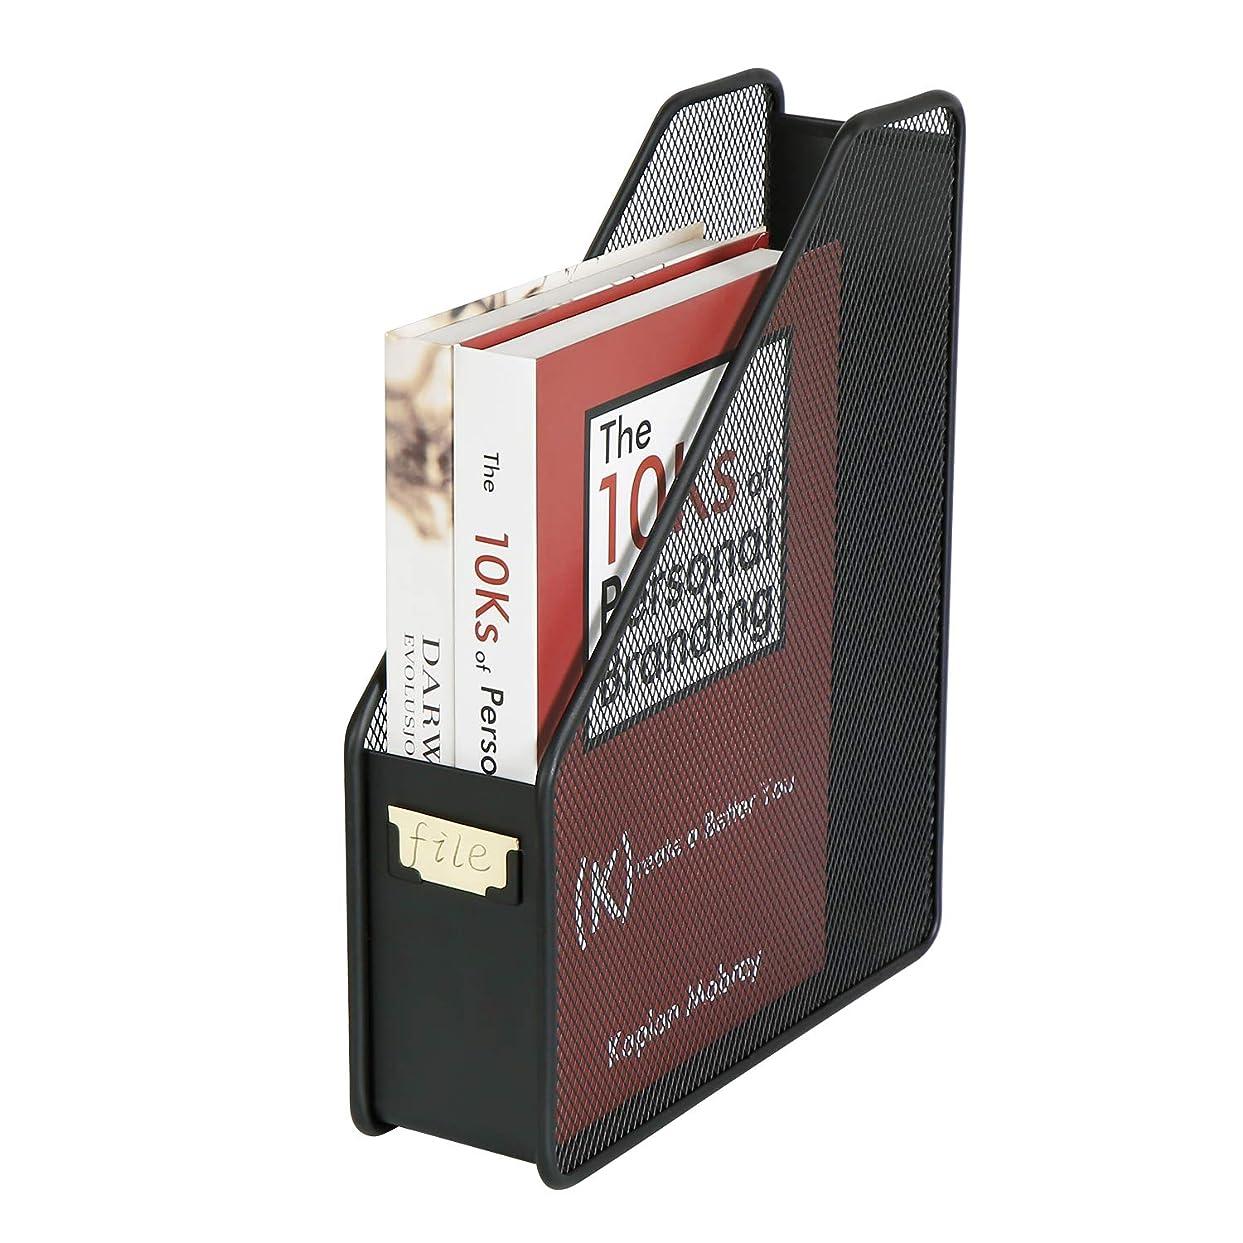 低下溶融苦情文句Designa Metal Mesh Magazine File Holder Desk Book Organizer Office Accessary - Black